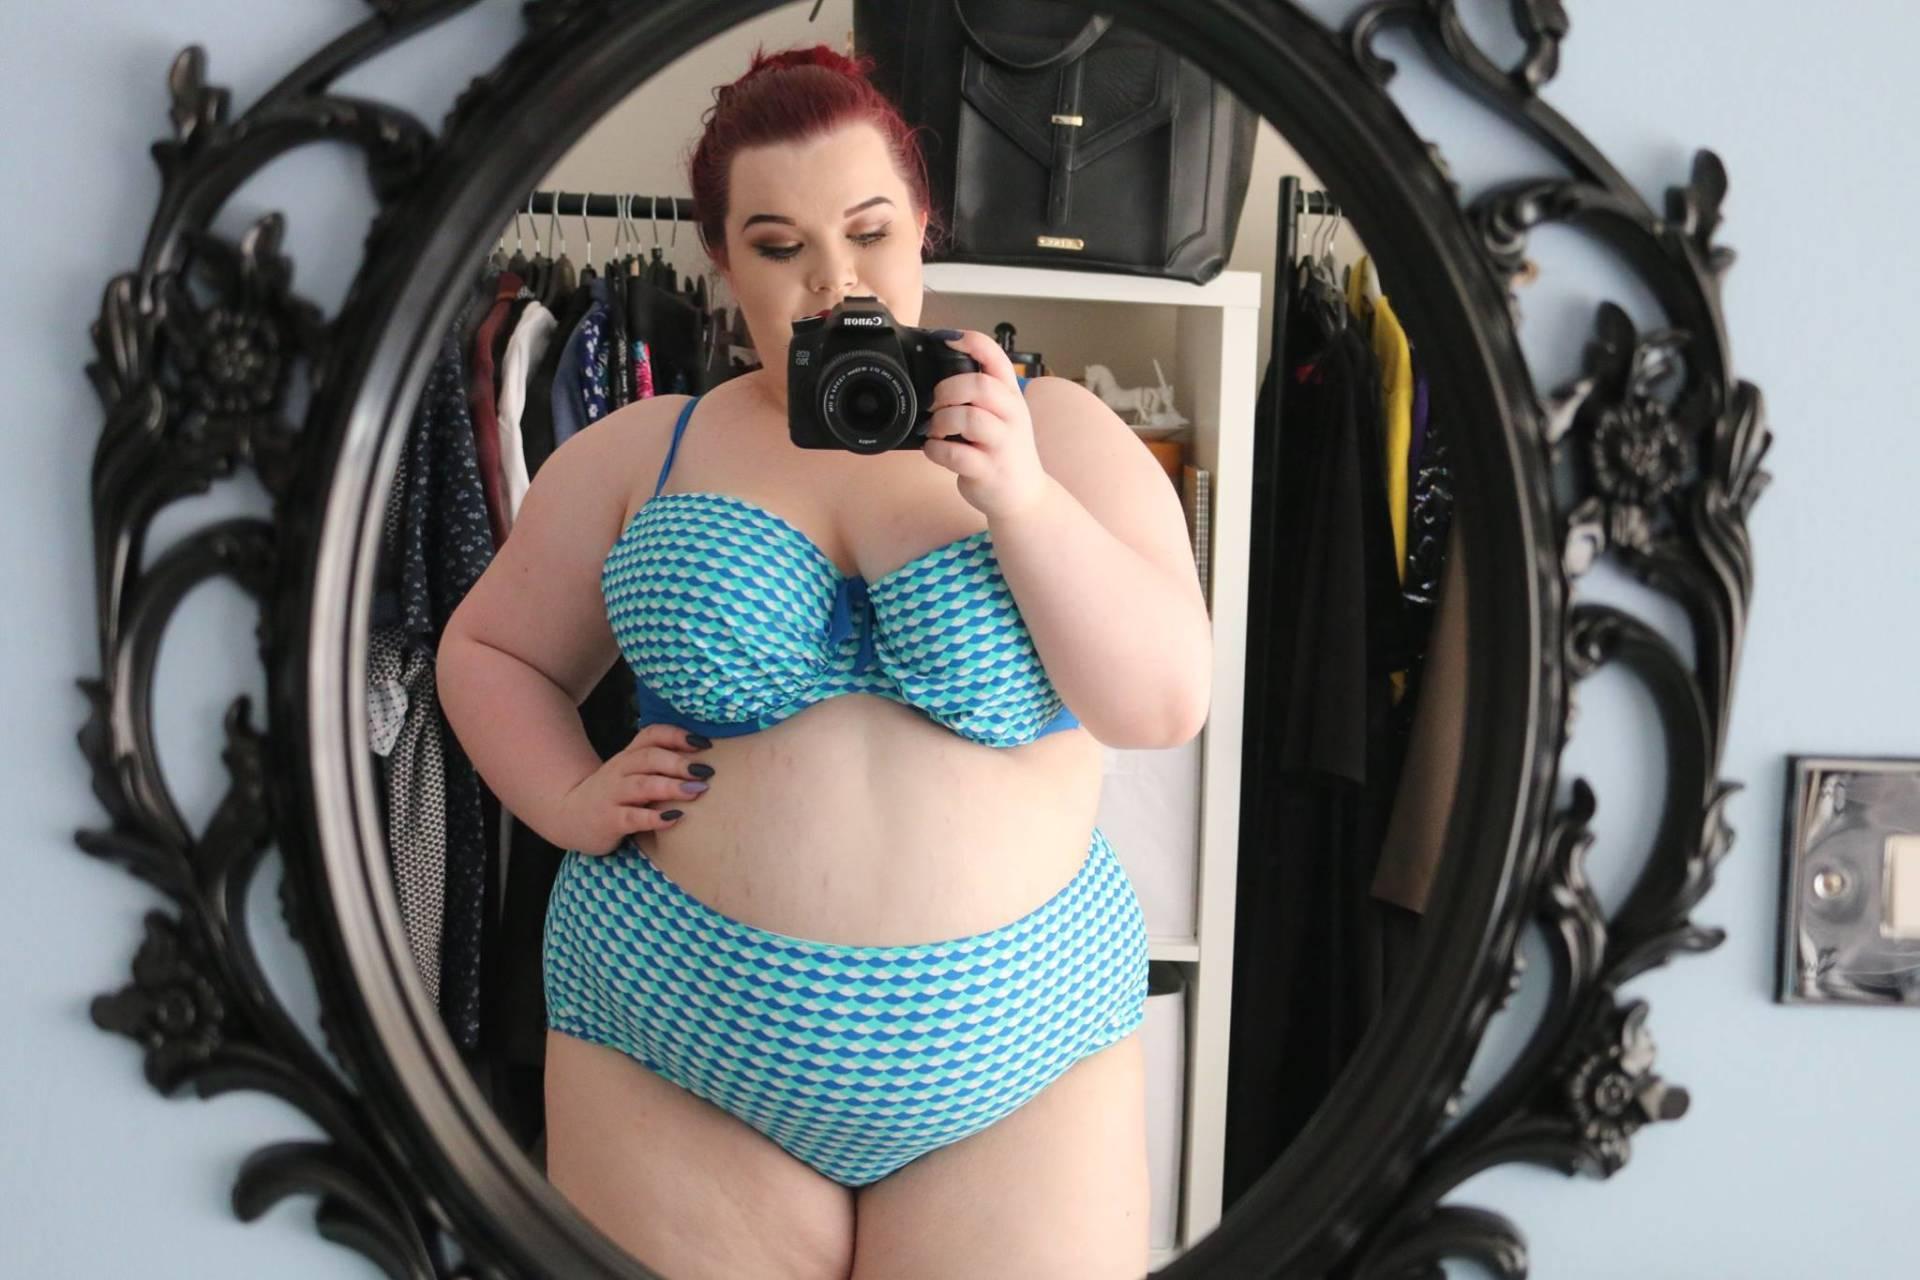 ba89b58c08da2 Plus Size Swimwear Haul Try On - She Might Be Loved